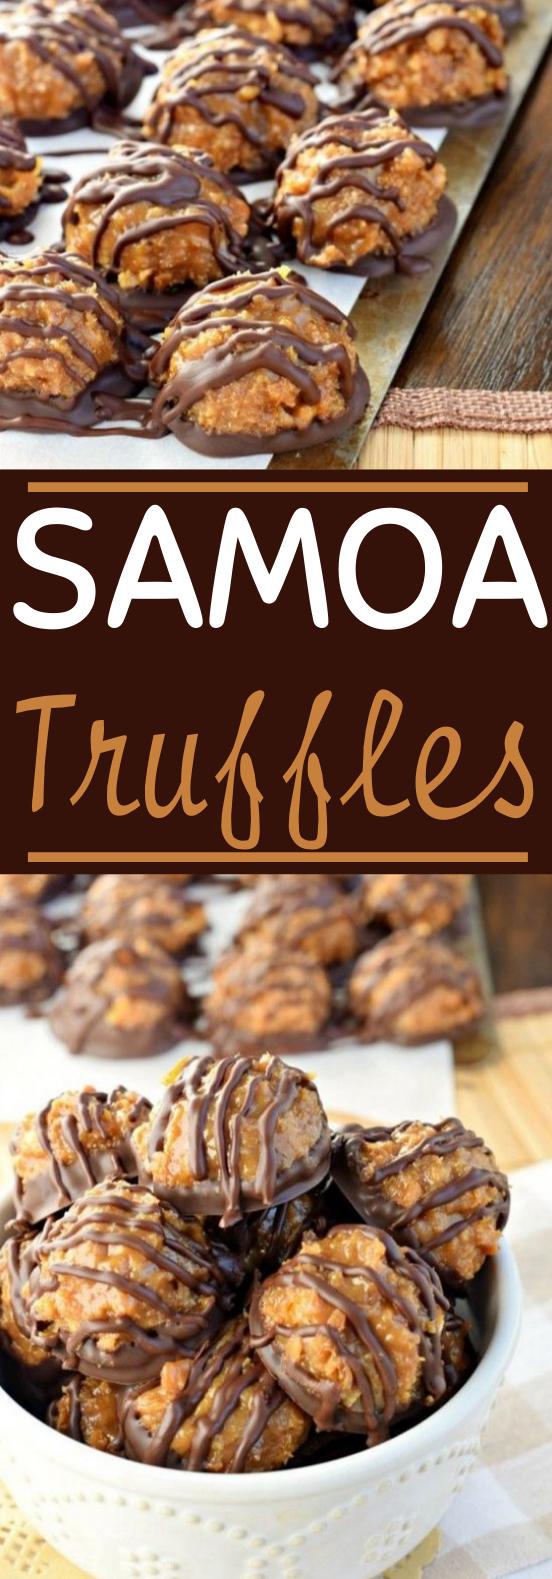 Samoa Truffles #easy #desserts #nobake #chocolate #cookies